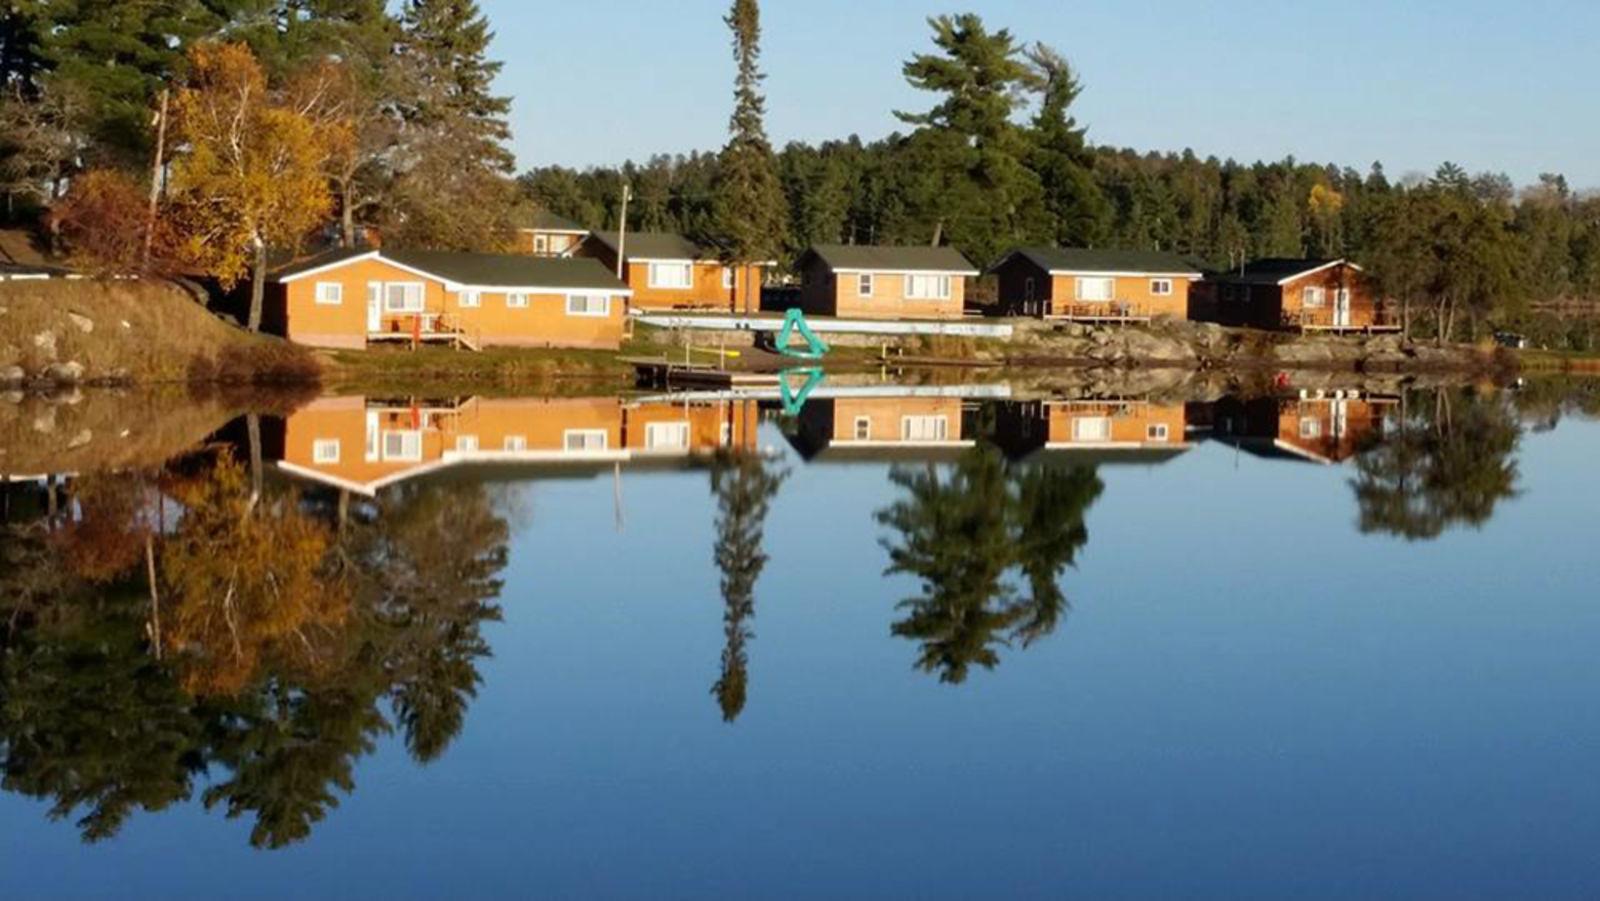 Arrowhead resort motel sunset country ontario canada